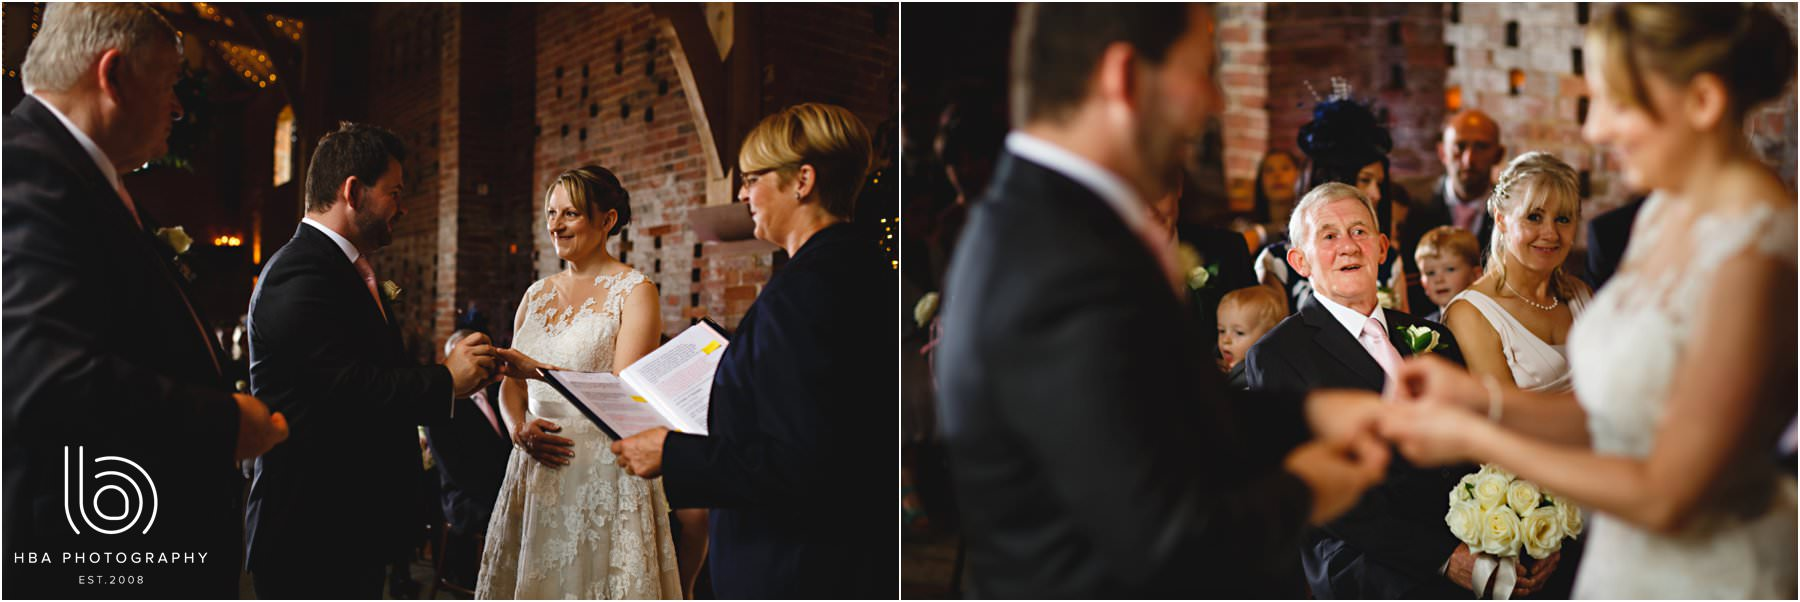 the wedding ceremony at Shustoke